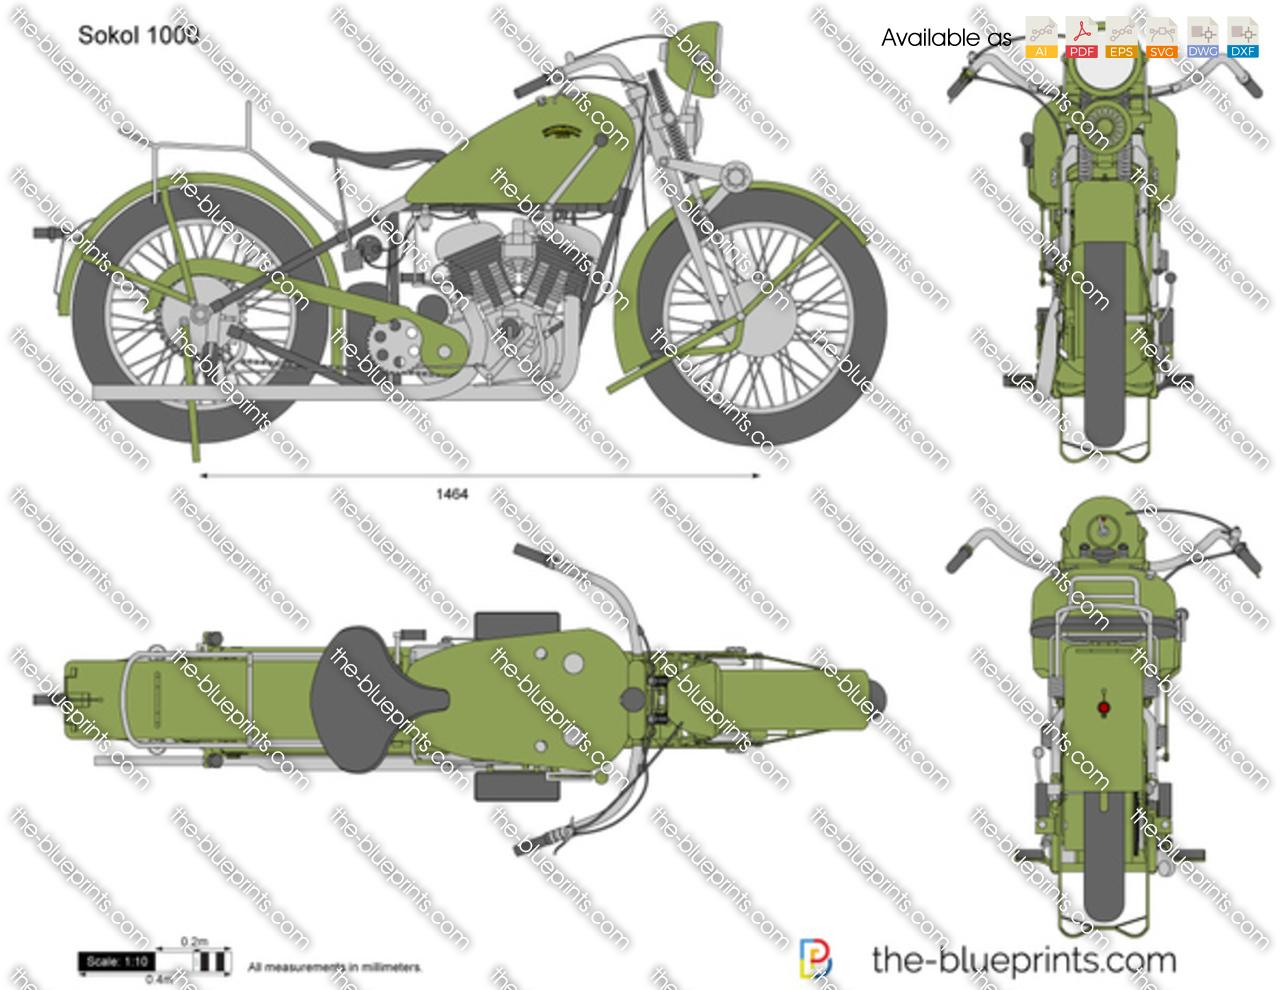 Sokol 1000 1937